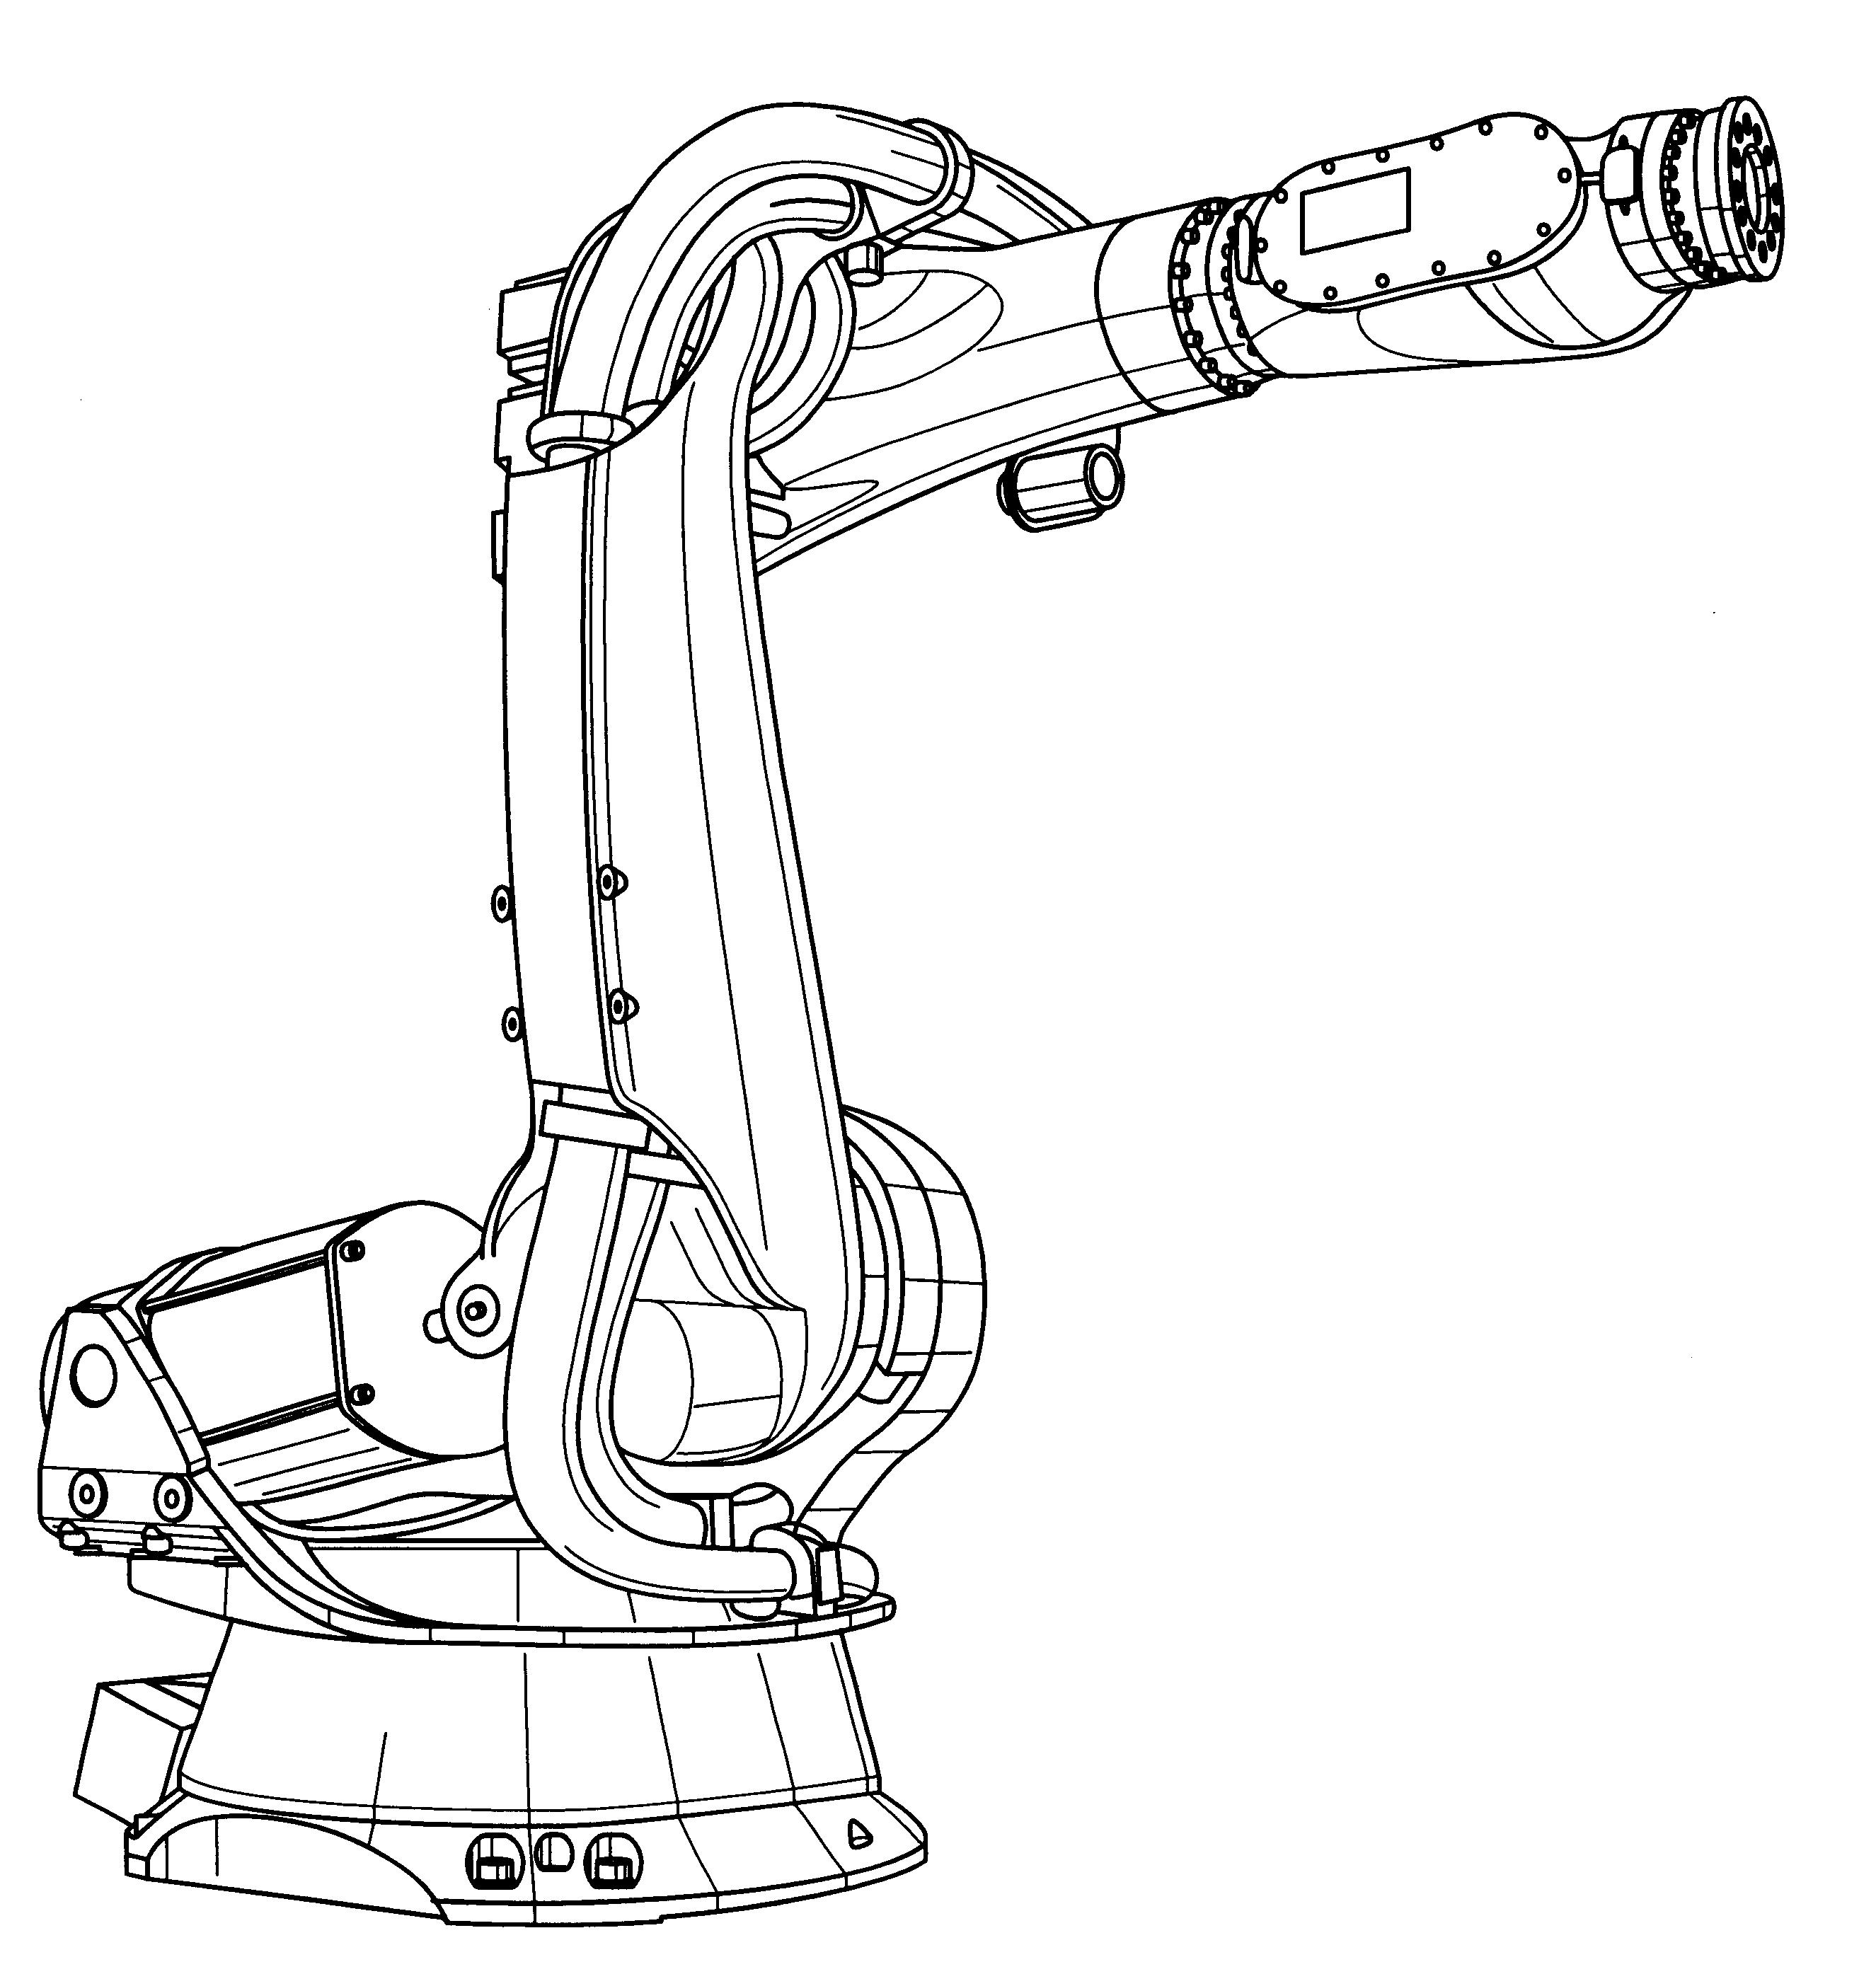 Pin By Bowon Luang On Robot